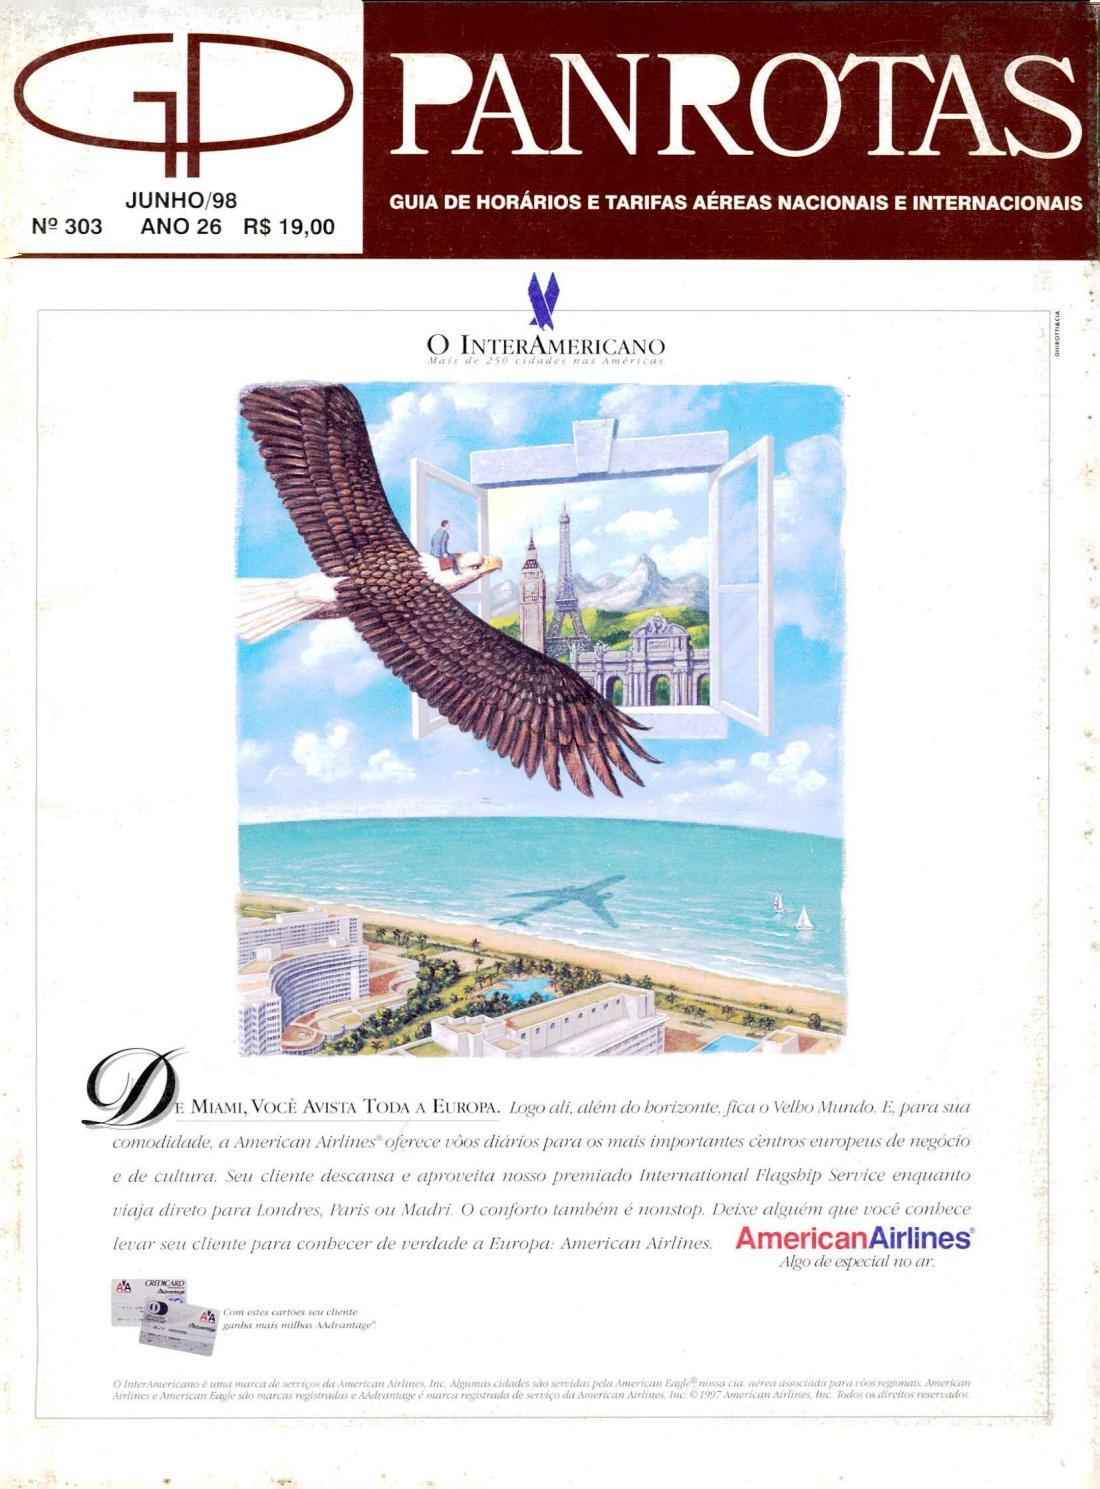 Guia PANROTAS - Edição 303 - Junho 1998 by PANROTAS Editora - issuu fac972b83f